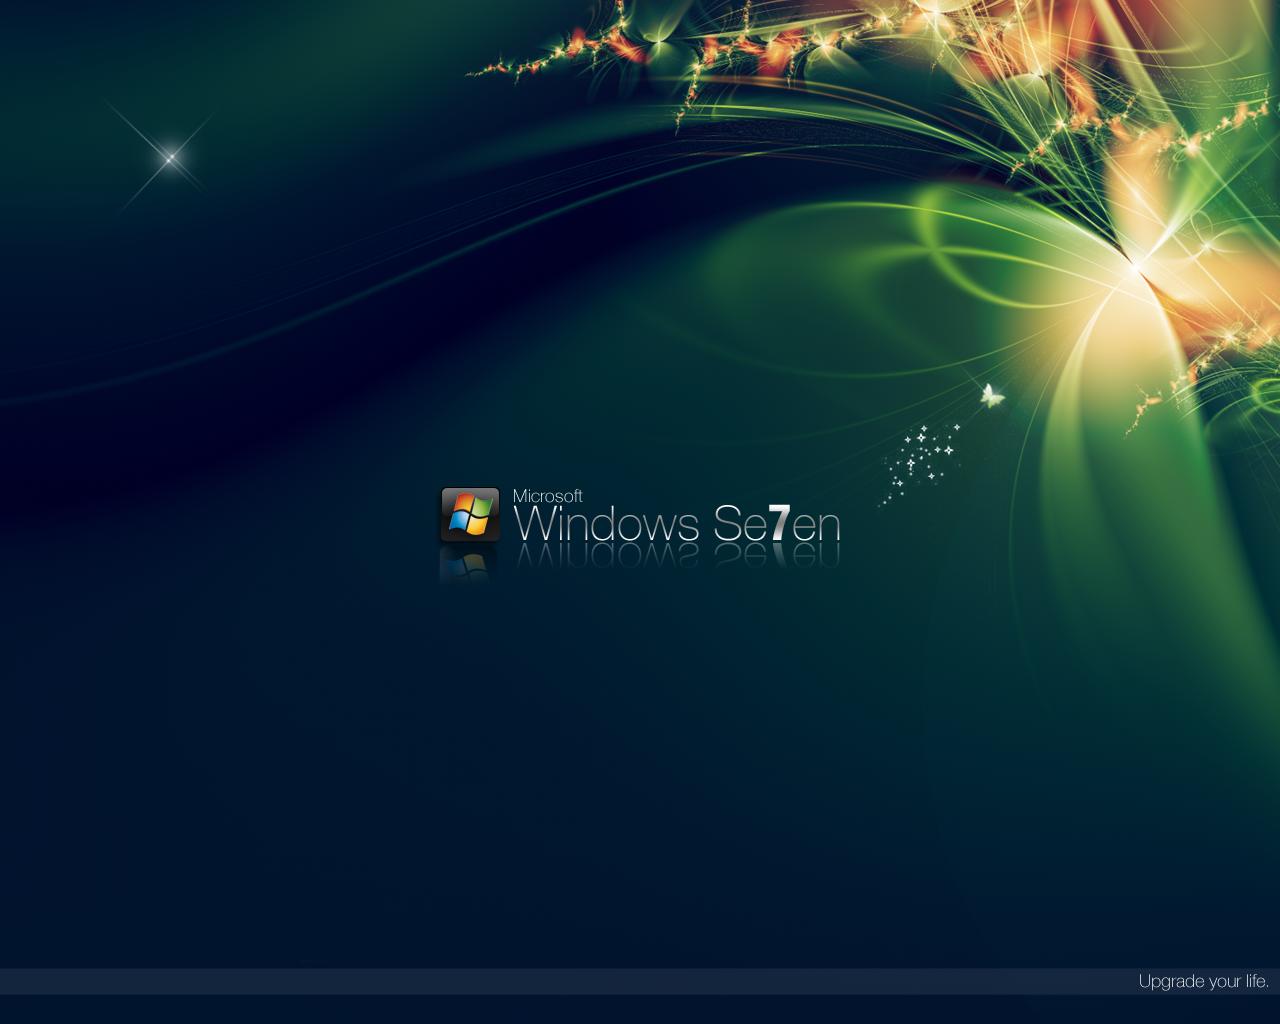 http://1.bp.blogspot.com/-rZSW9aCyi0c/TaMIsOl7XyI/AAAAAAAAAPE/UZFVOu5yLCU/s1600/windows_seven_wallpaper_v_2_by_youness_toulouse.png